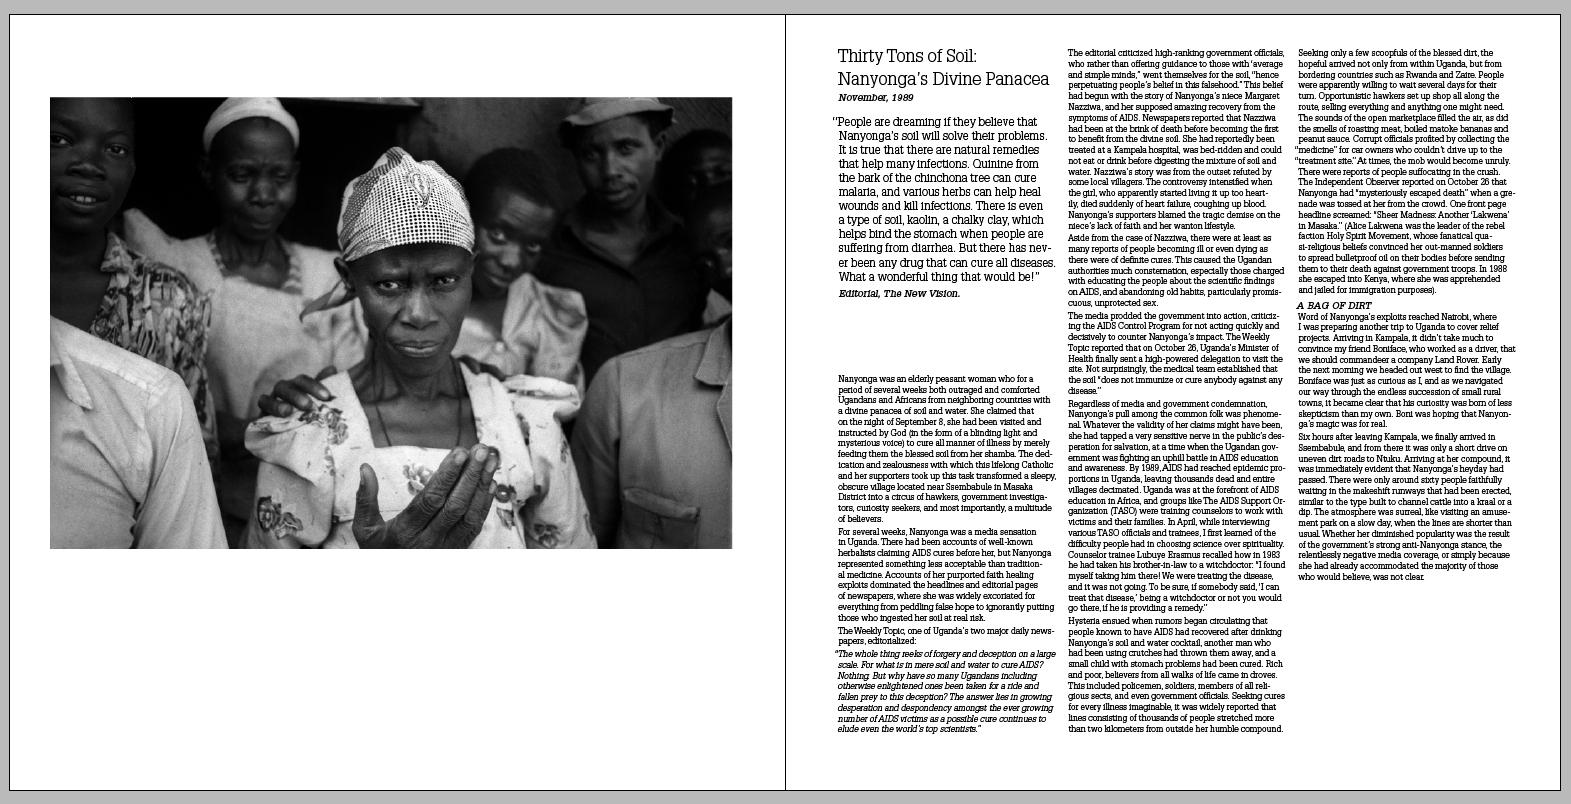 UGANDA AIDS NANYONGA.jpg